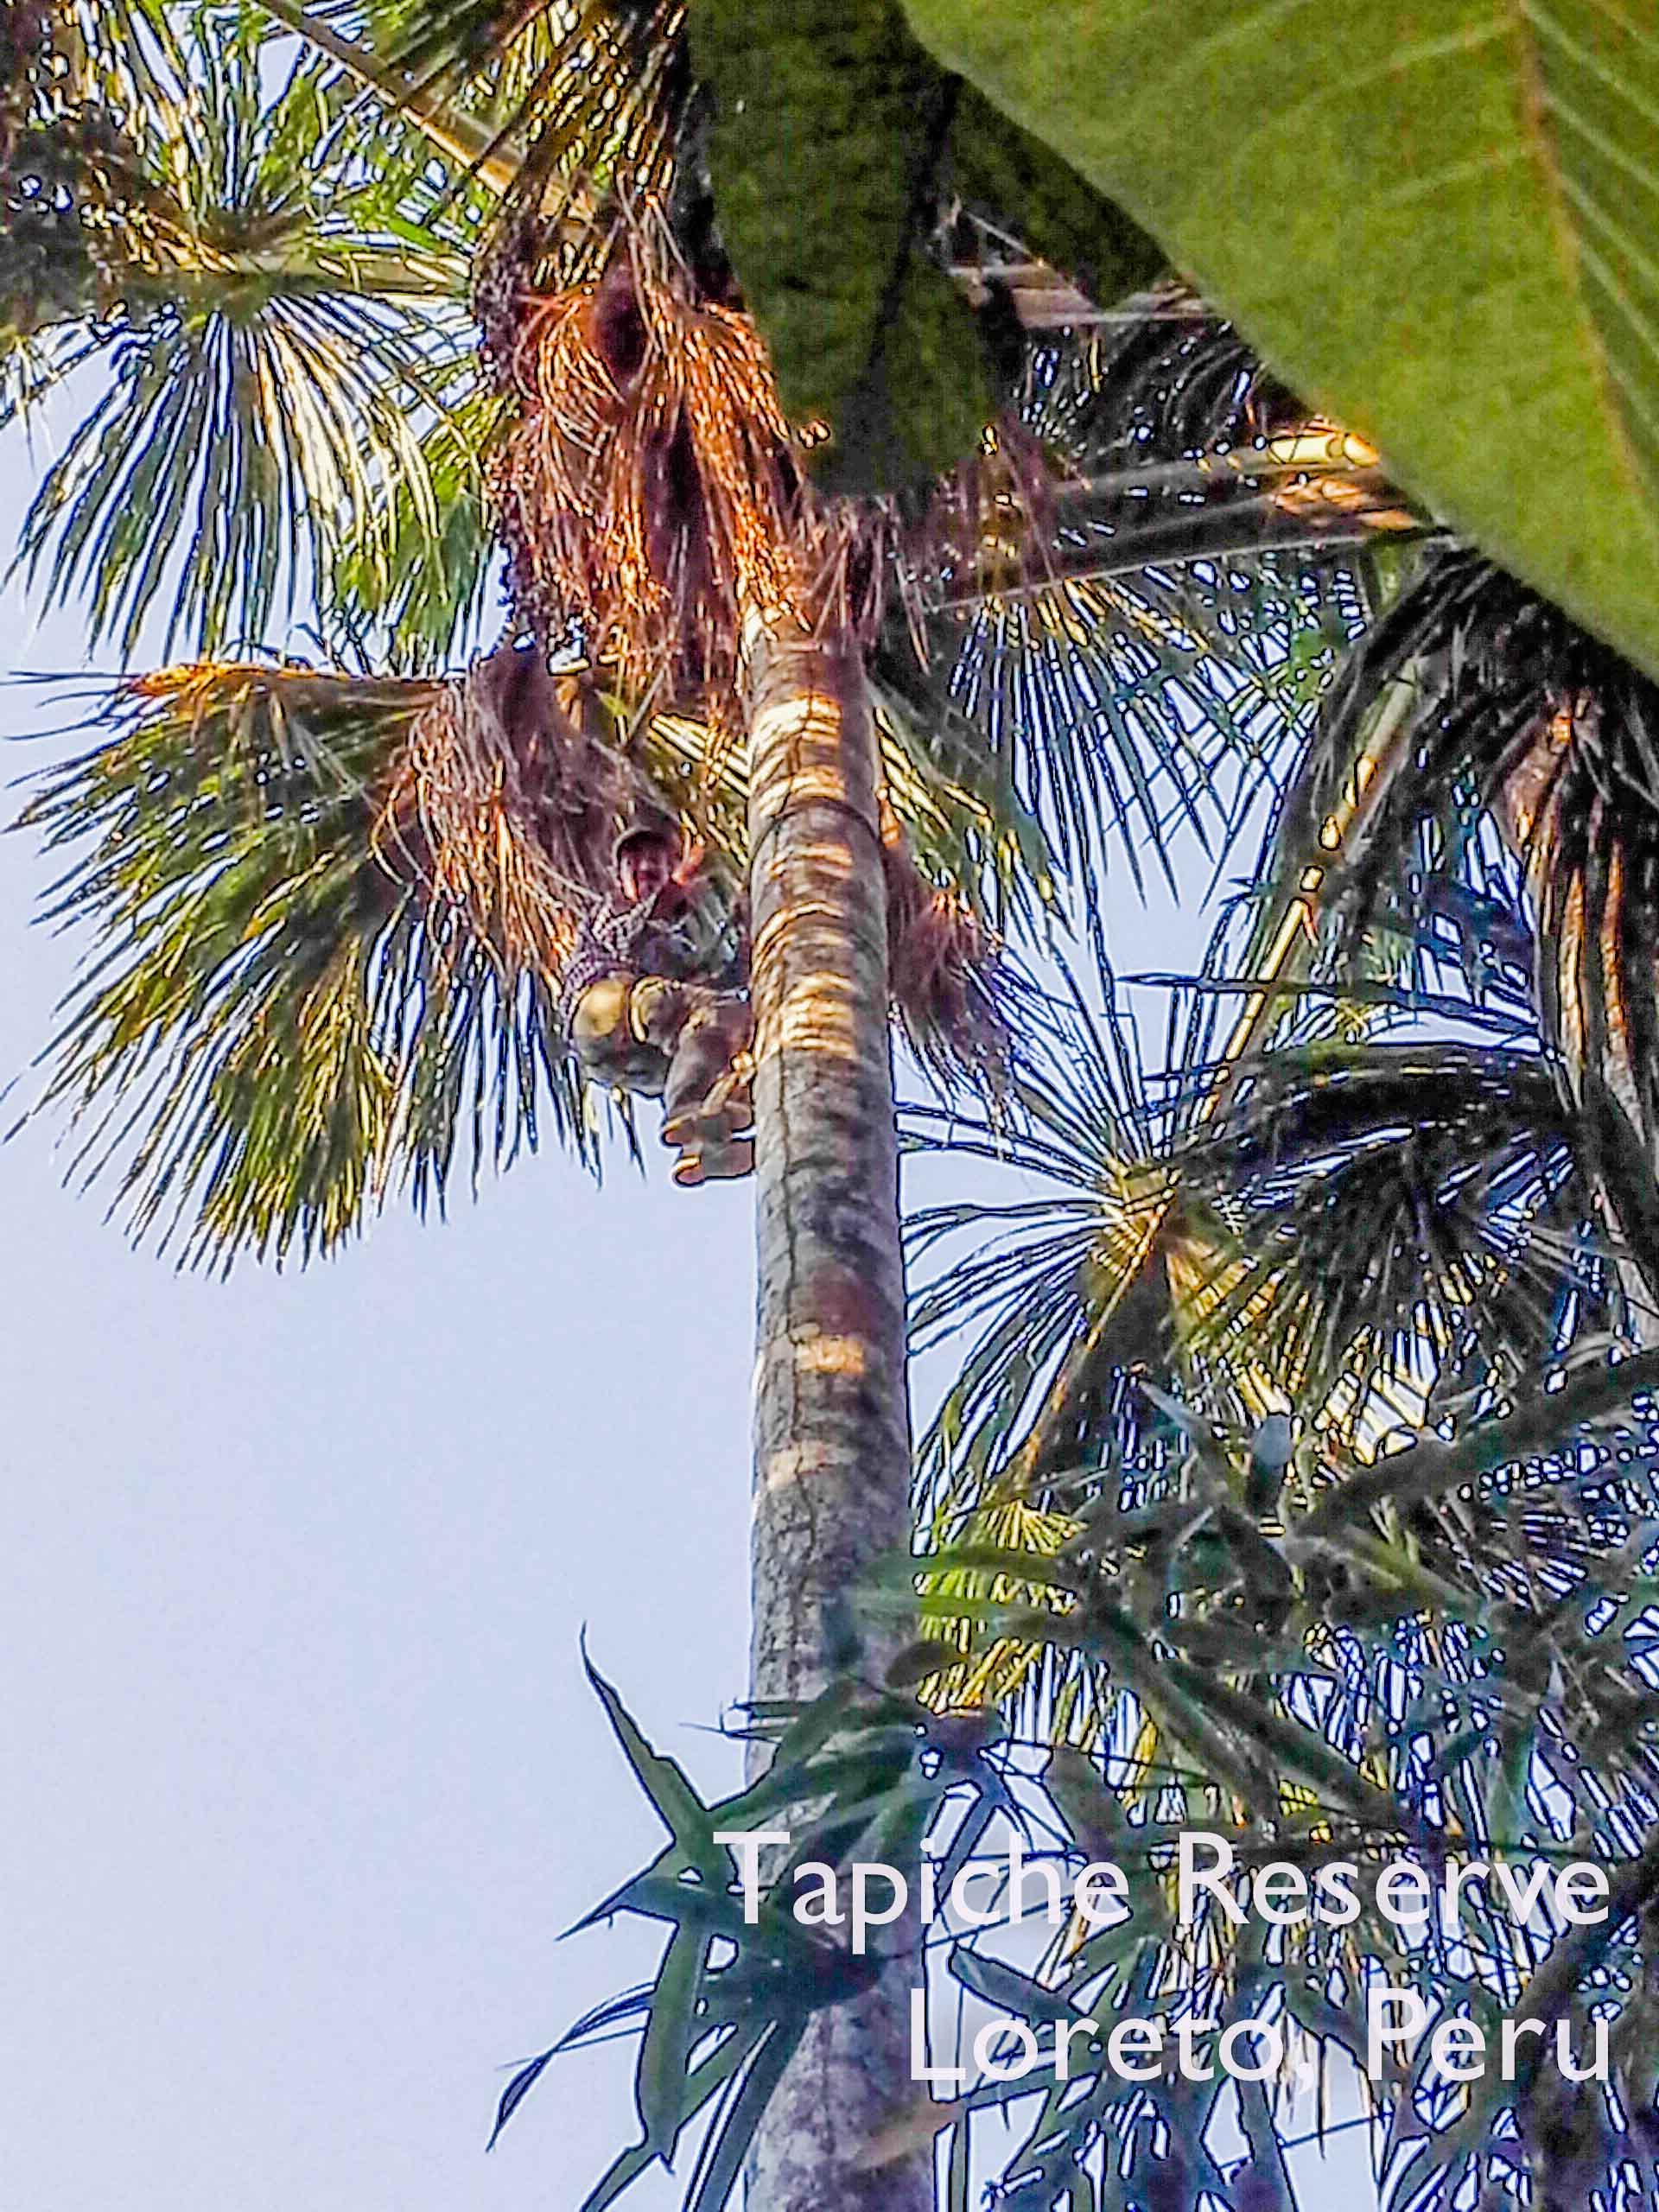 Tapiche-Amazon-Jungle-Tour-Peru-visitor-climbs-aguaje-buriti-palm-tree